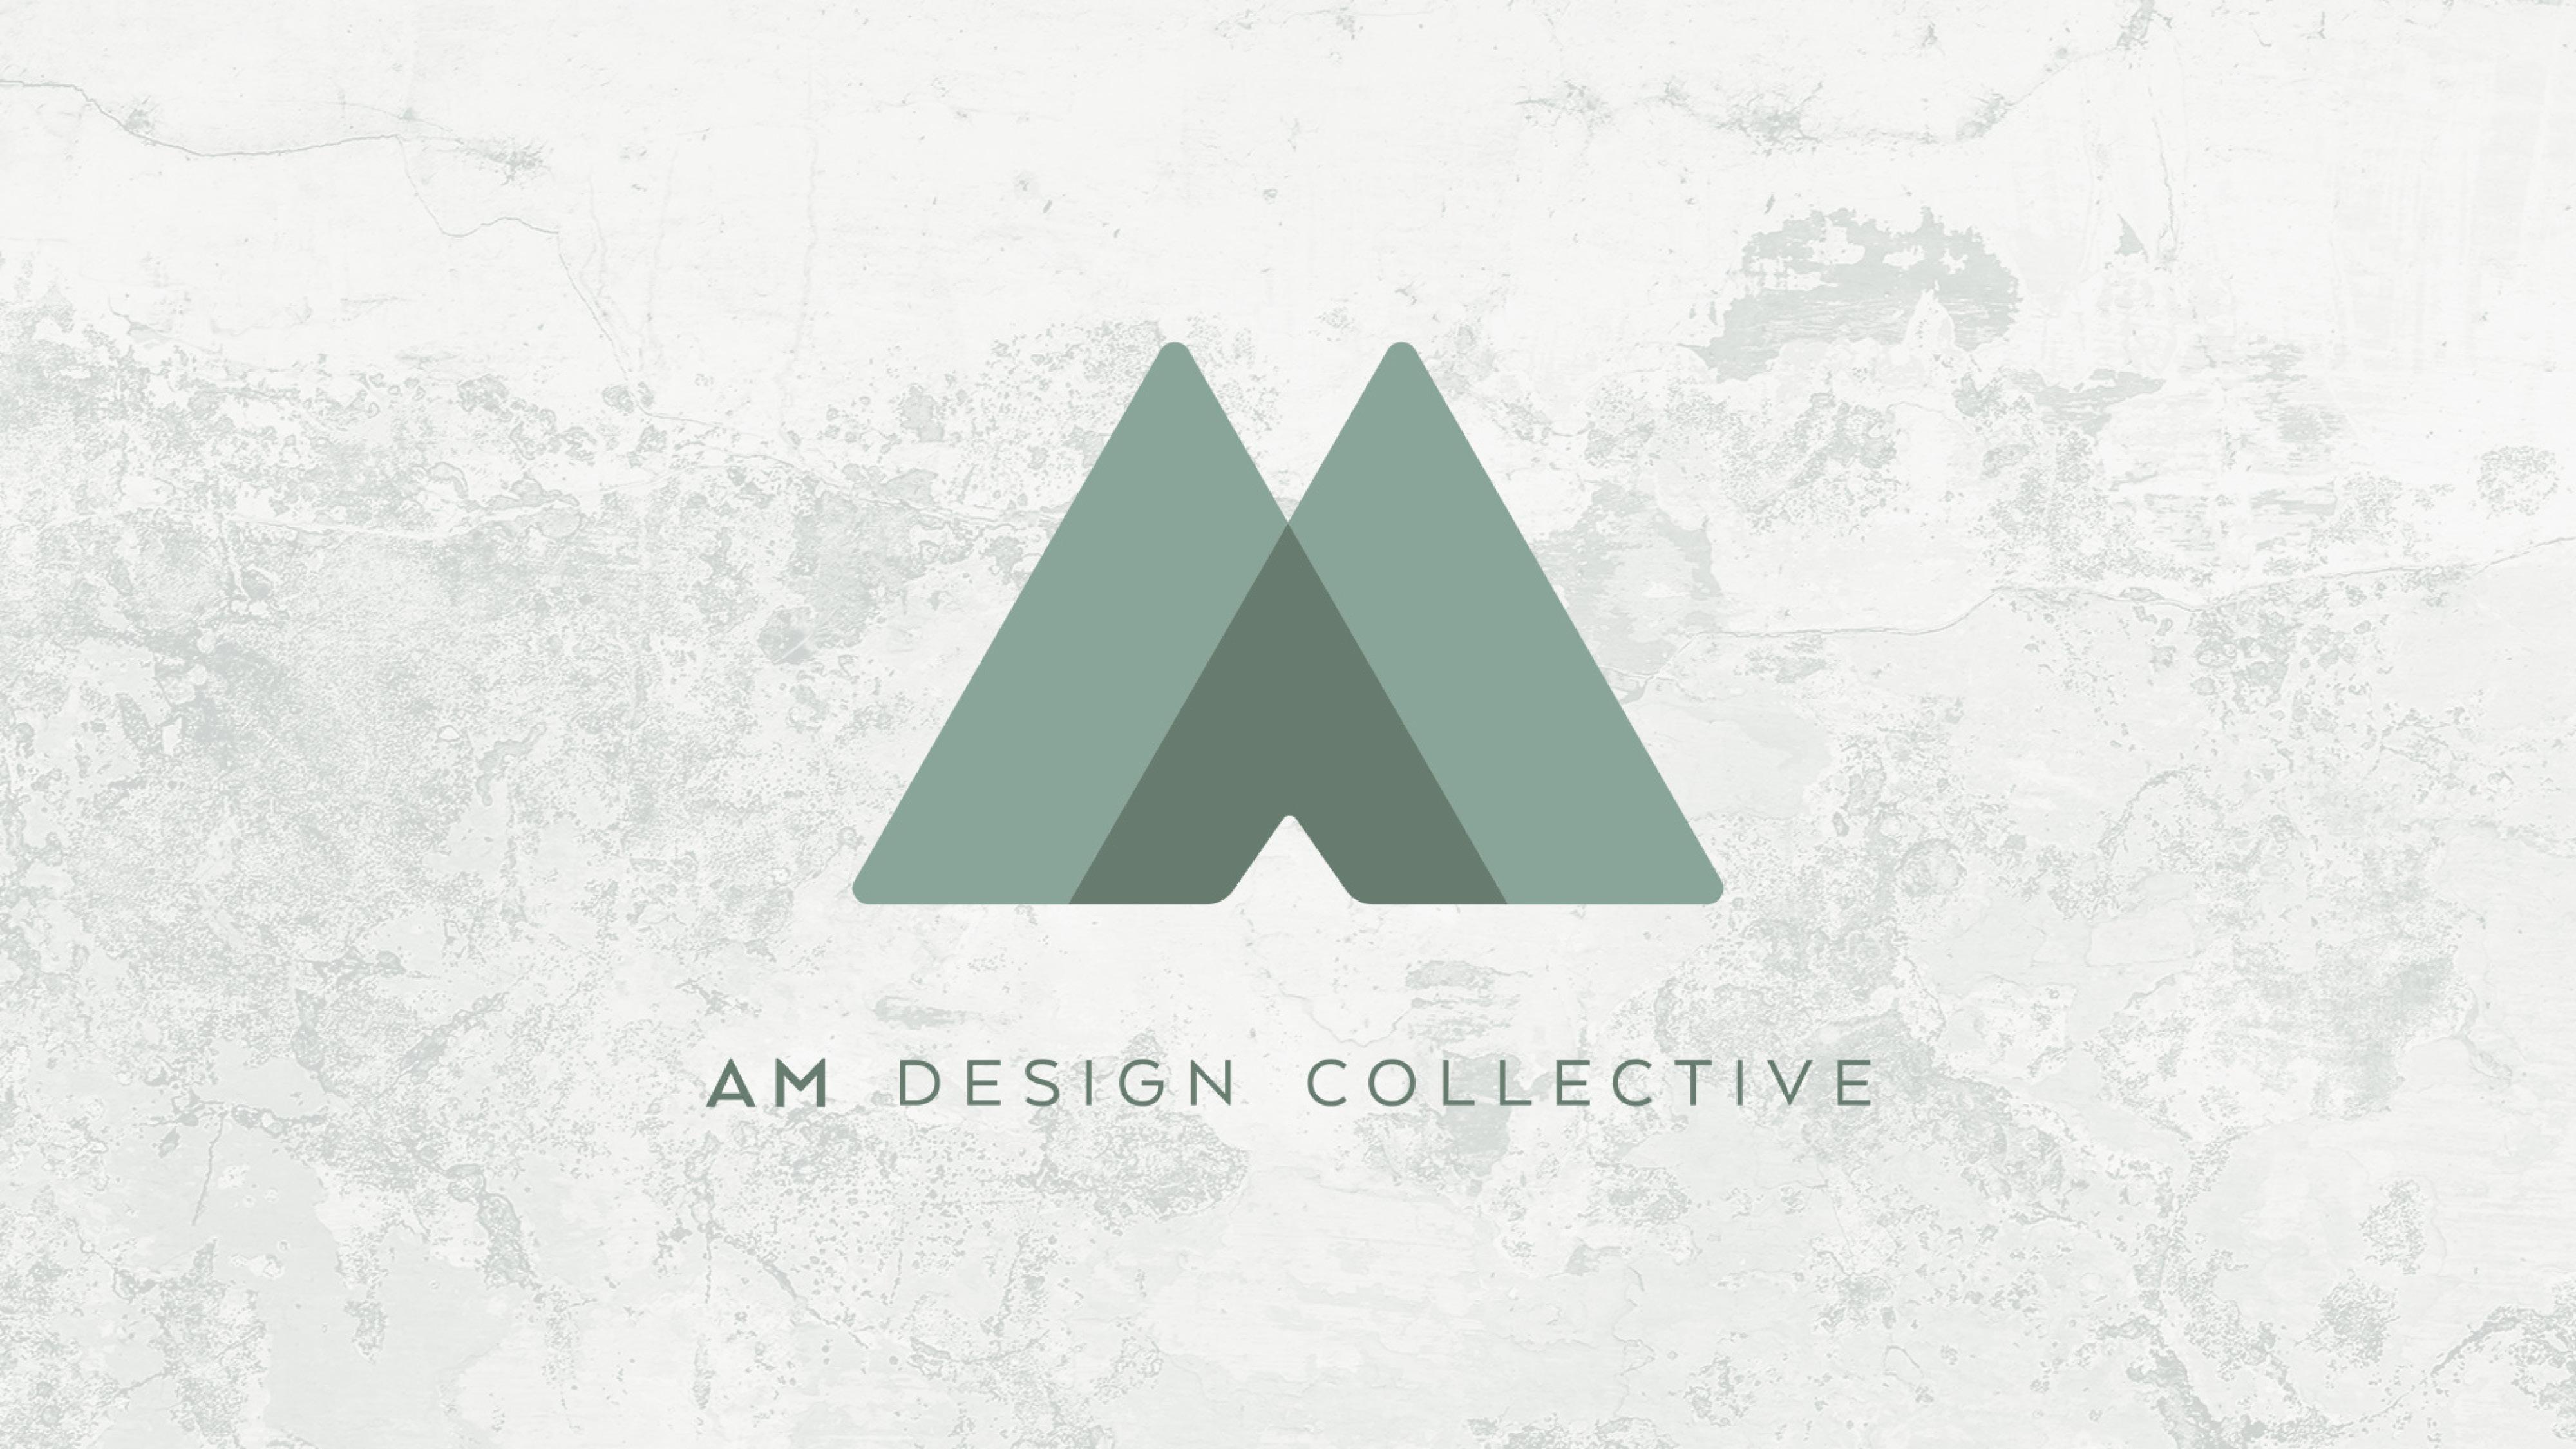 Jake Cooper Design - Logo - AM Design Collective